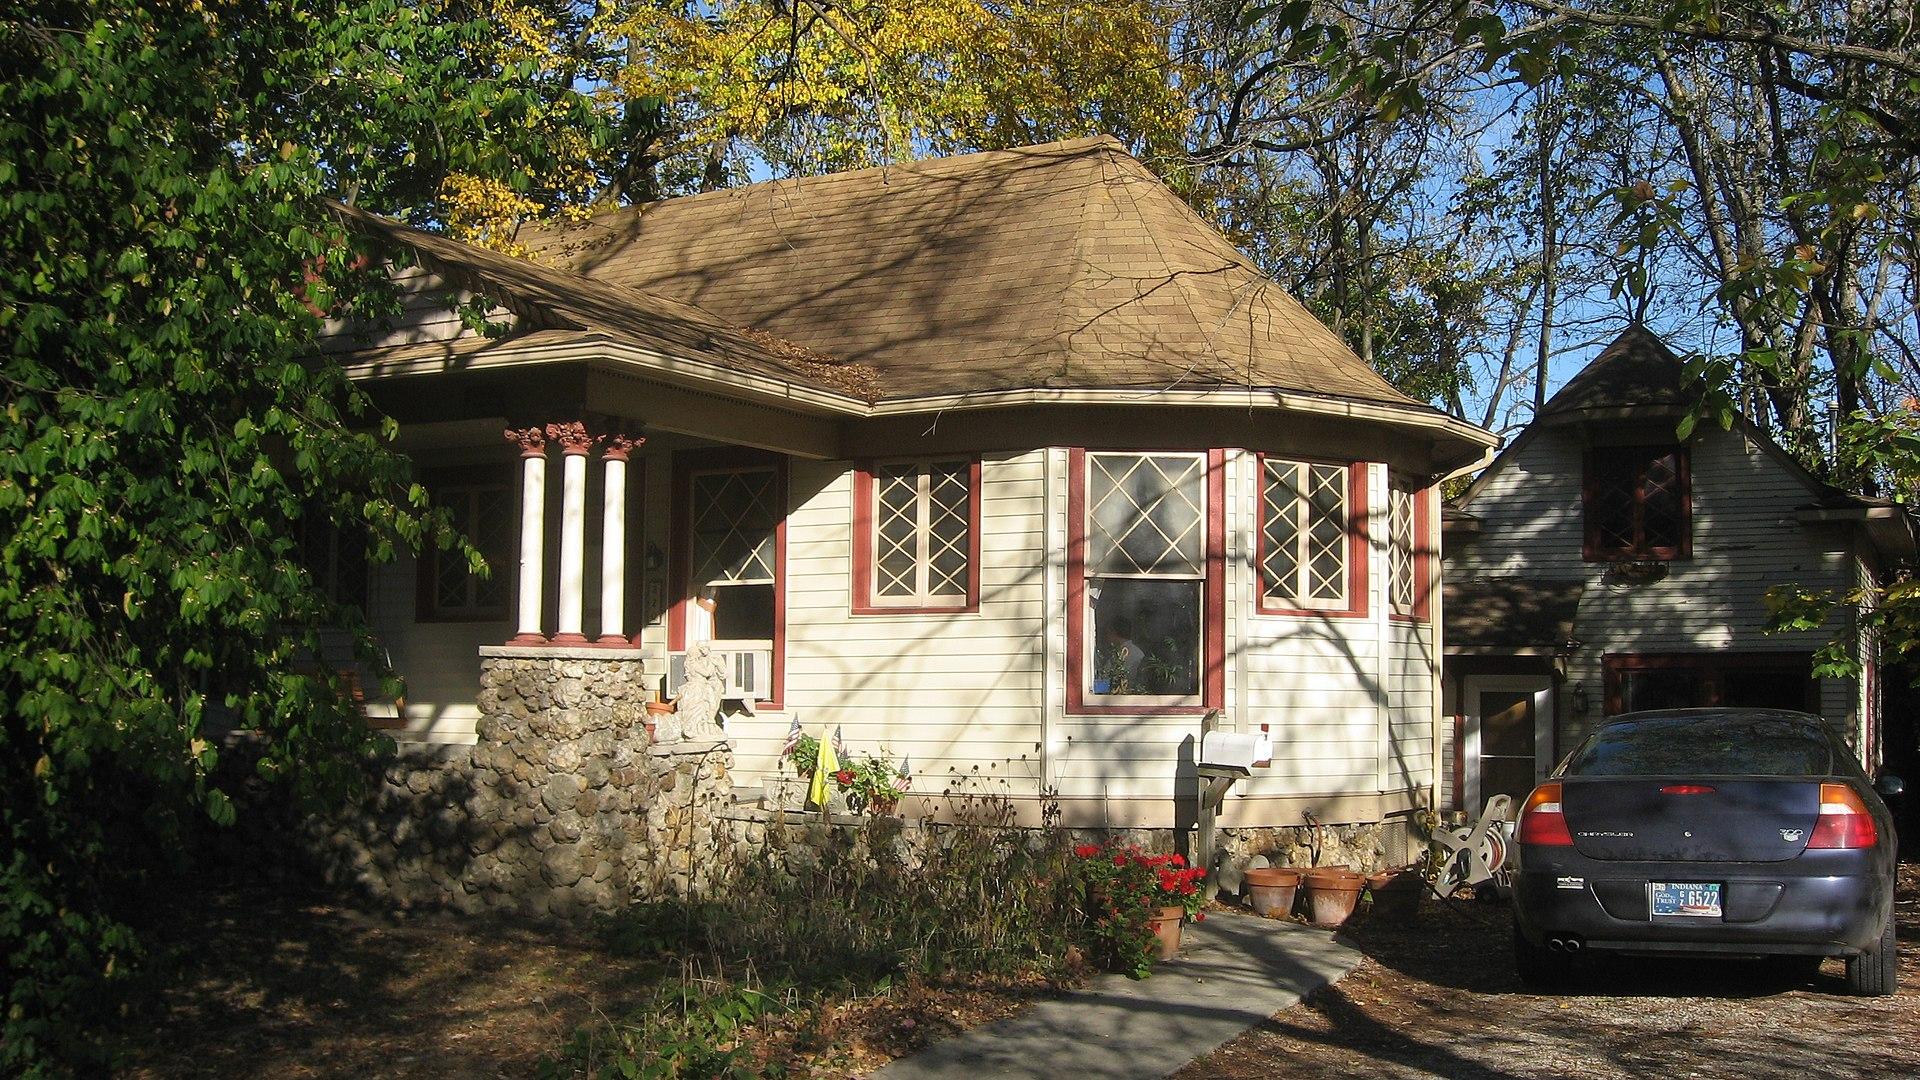 John L. Nichols House in Bloomington, Indiana